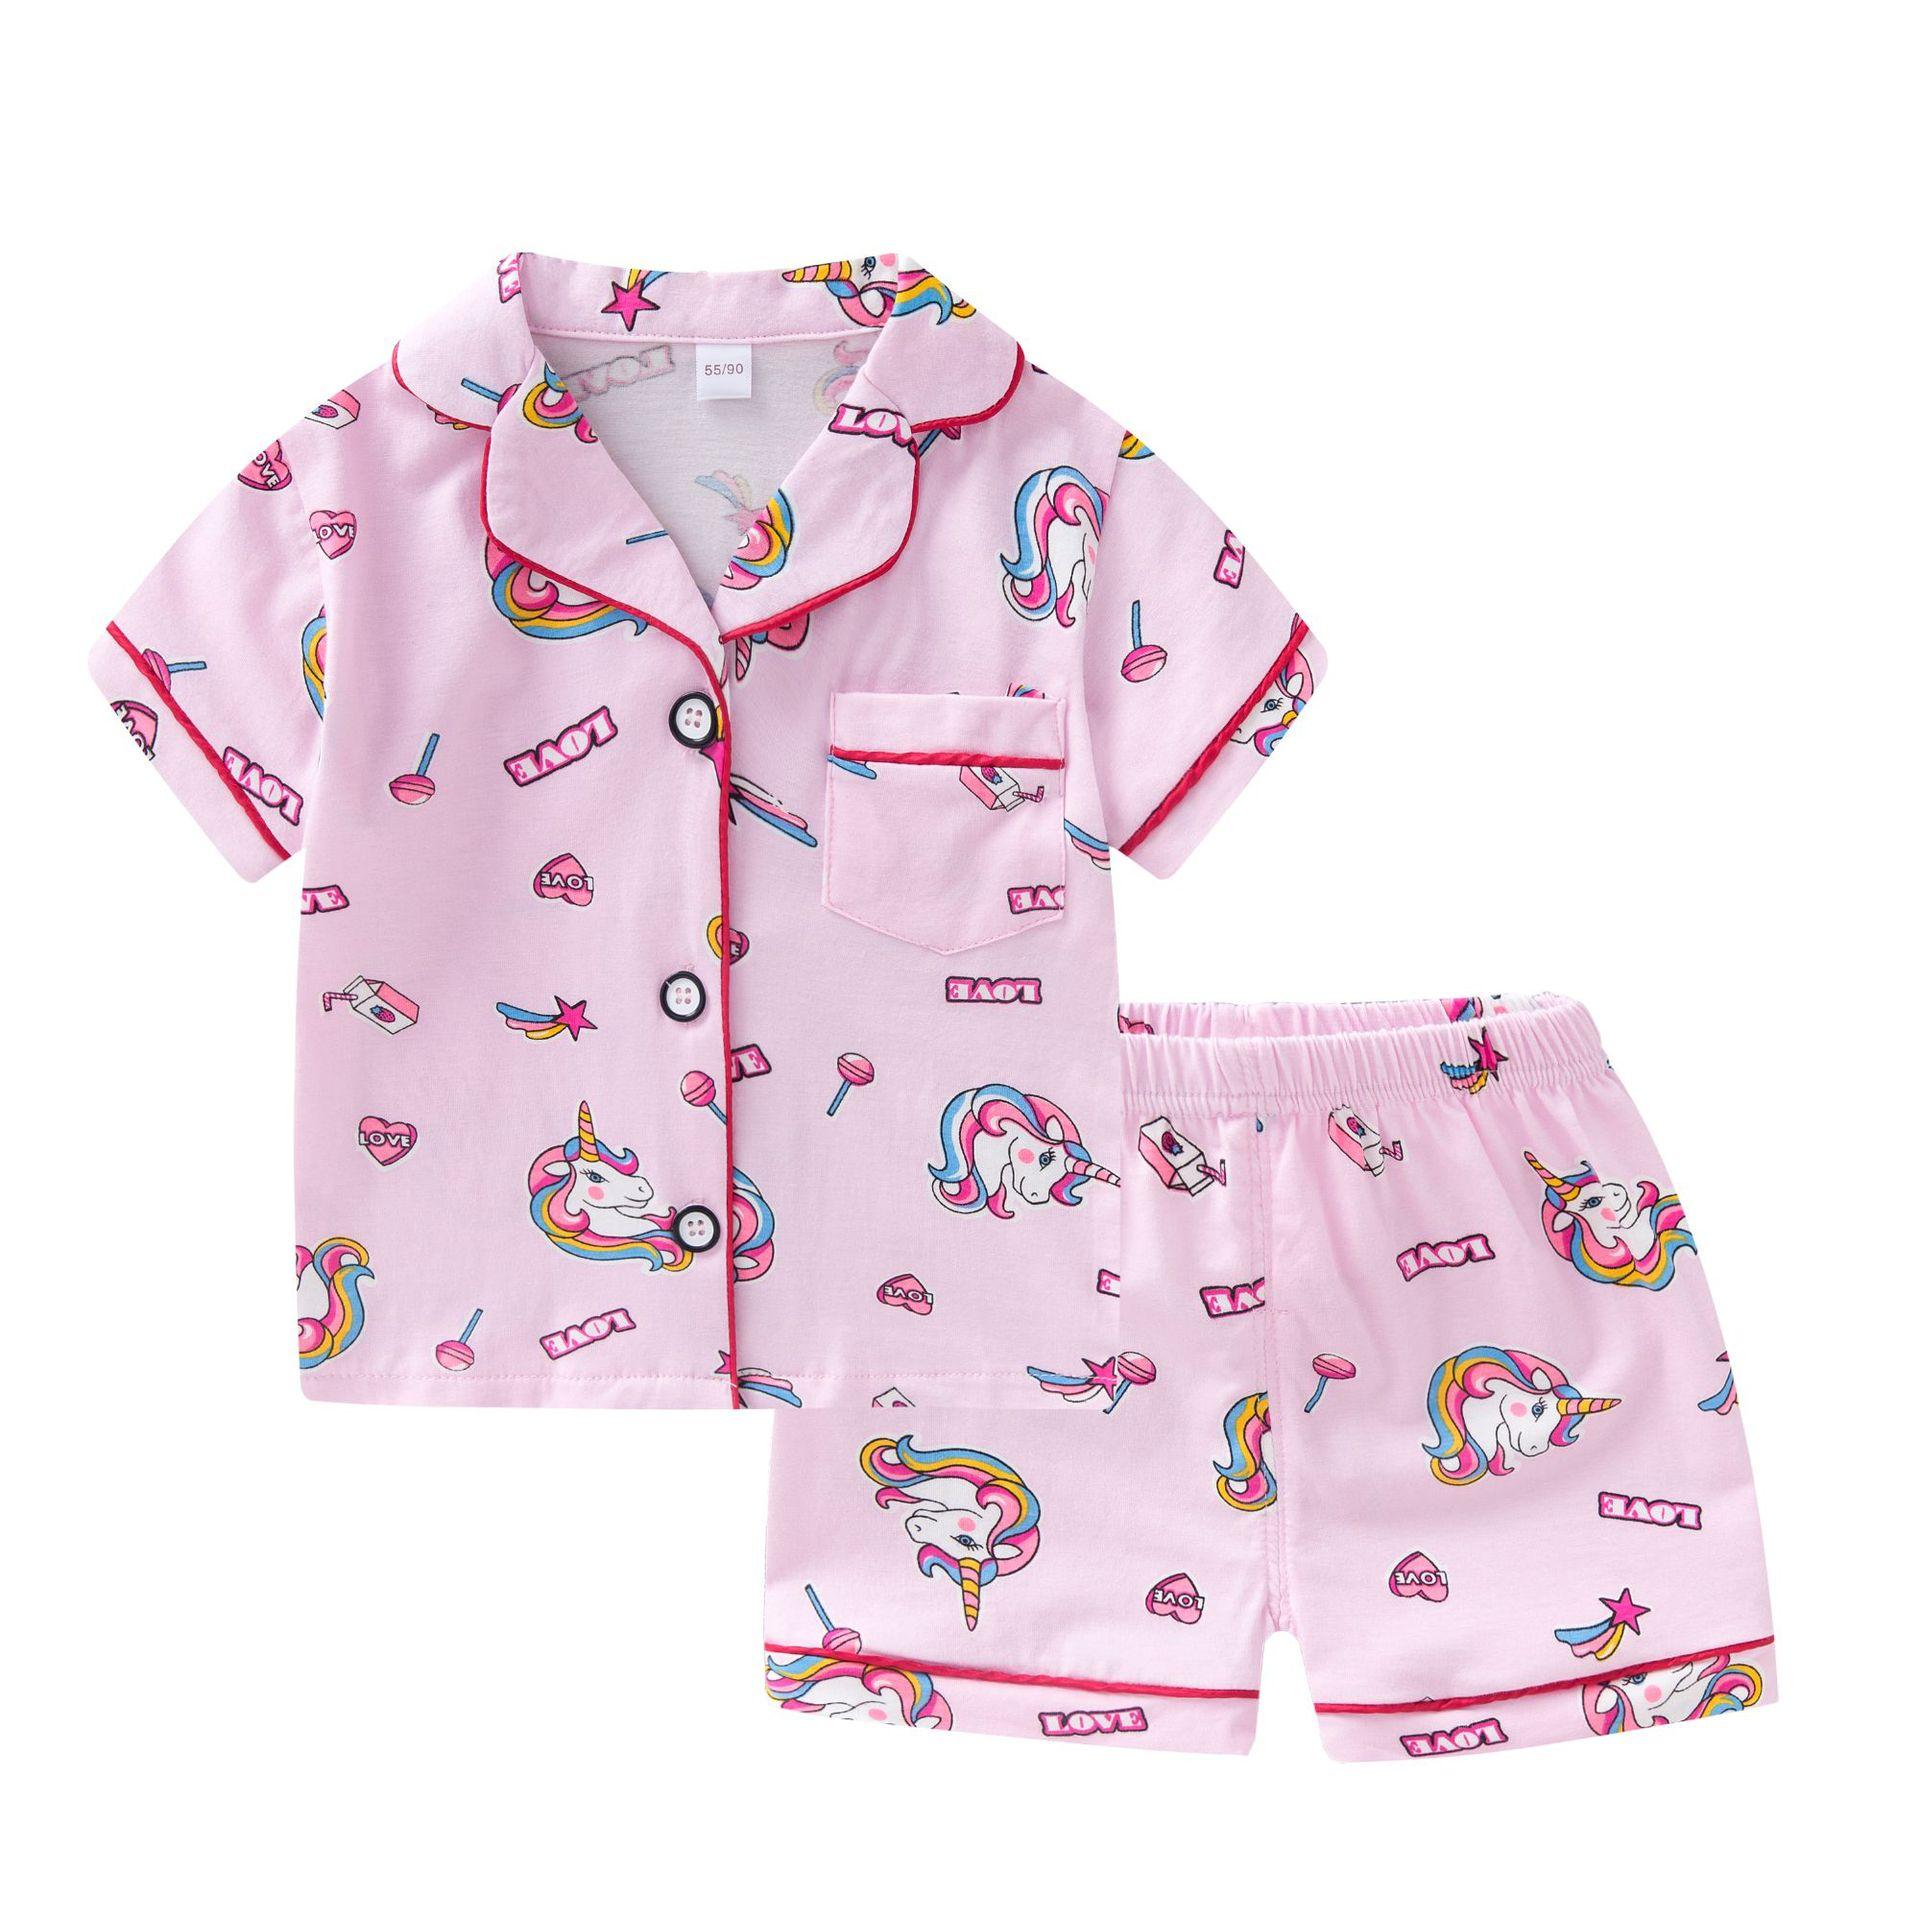 SAILEROAD 2020 New Cute Unicorn Pajamas For Girls Cartoon Animals Pyjamas For Kids Pijama Infantil Boys Sleepwear Clothes Sets 1